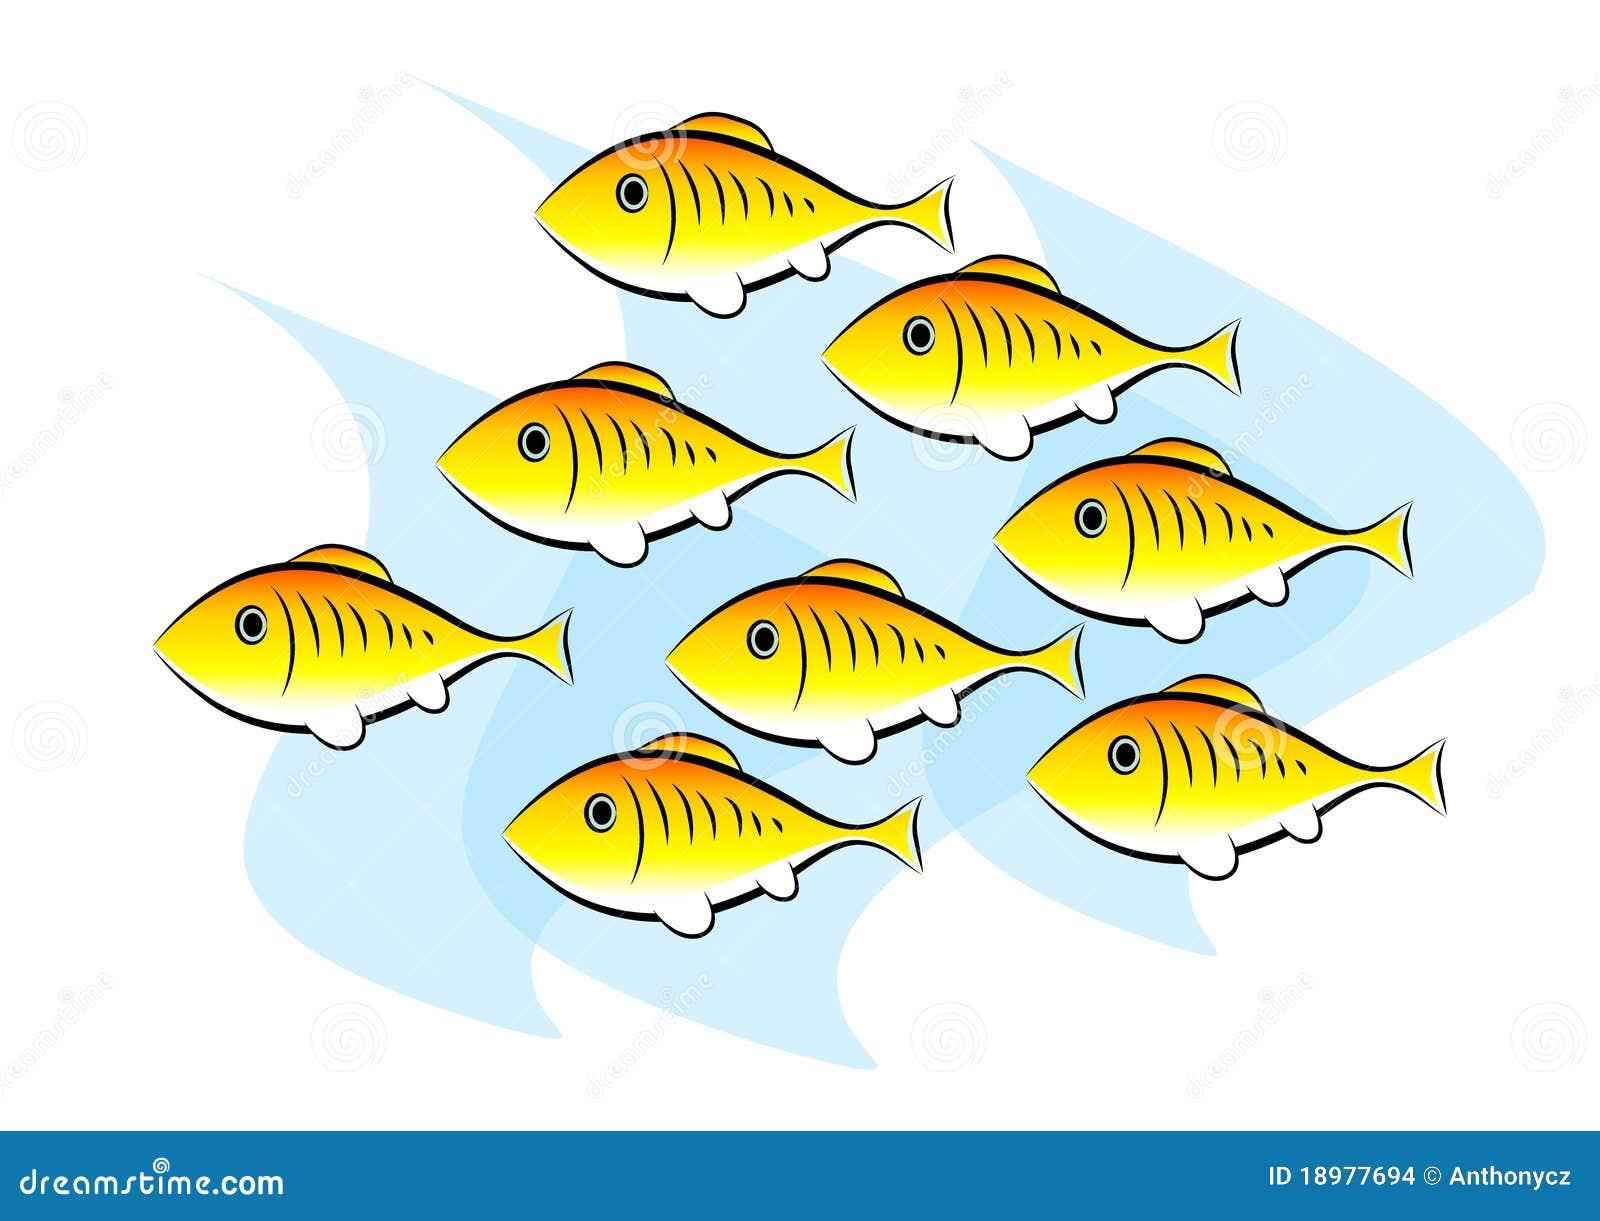 Clip art of fish stock vector illustration of water for Clip art fish